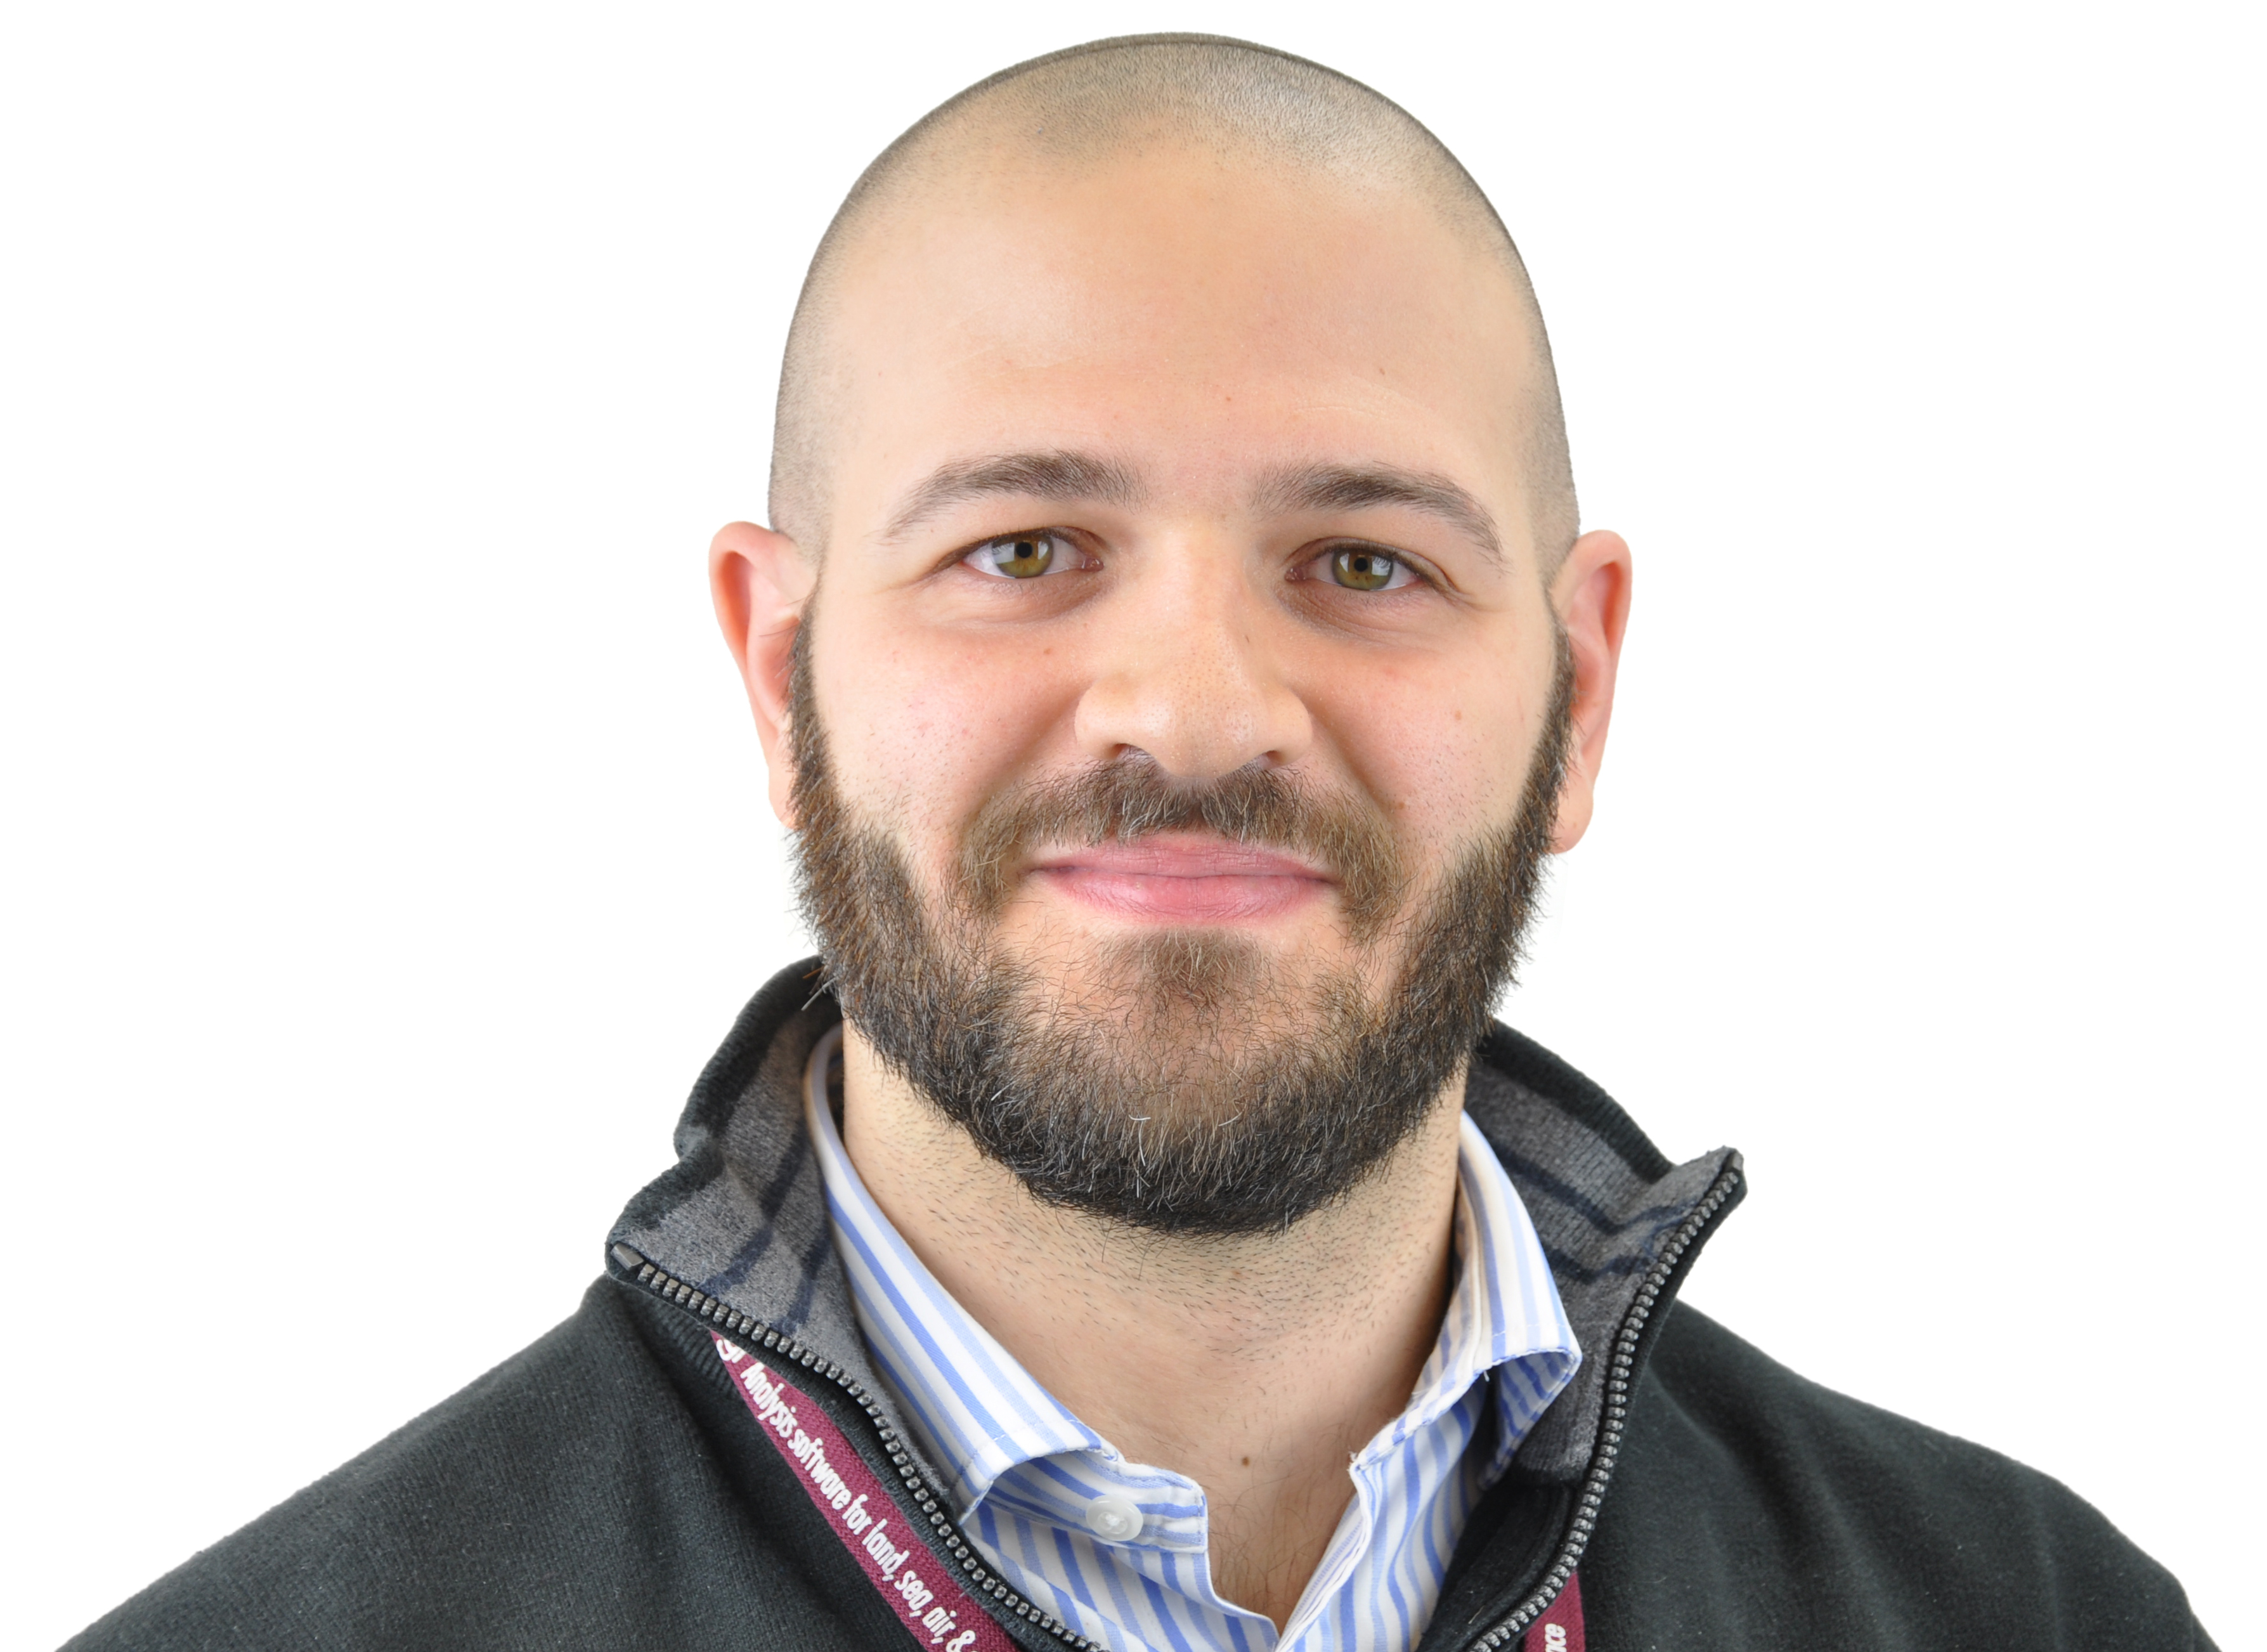 Roberto Gemma